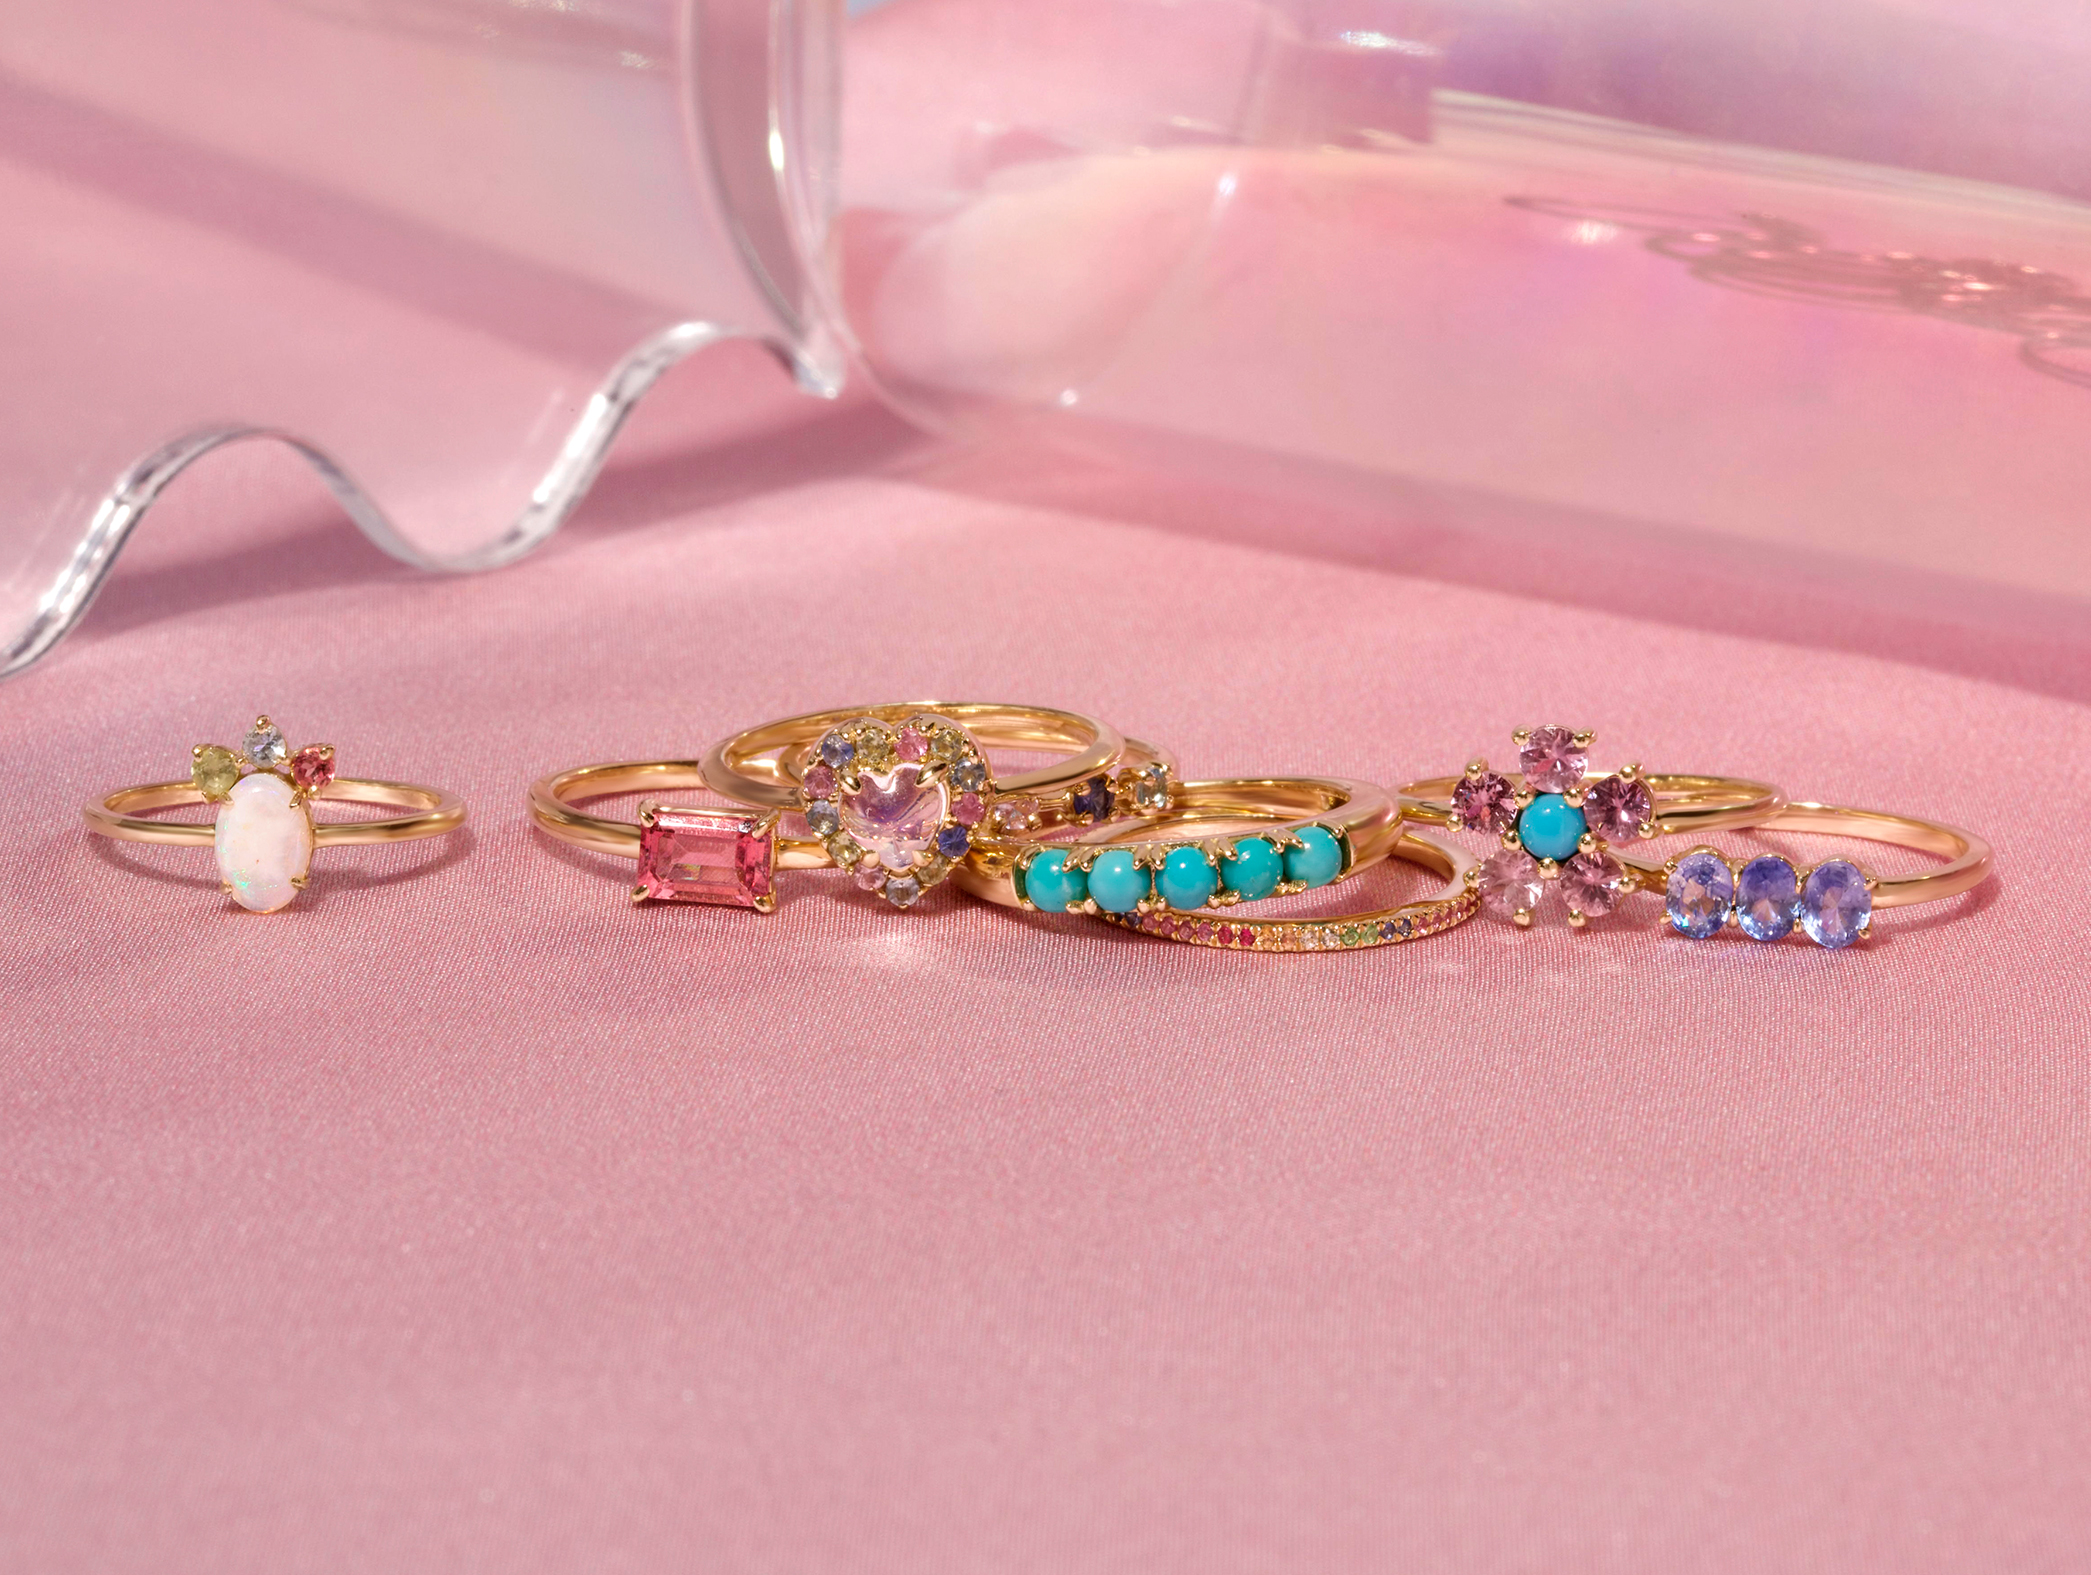 Colorful Gemstone Rings